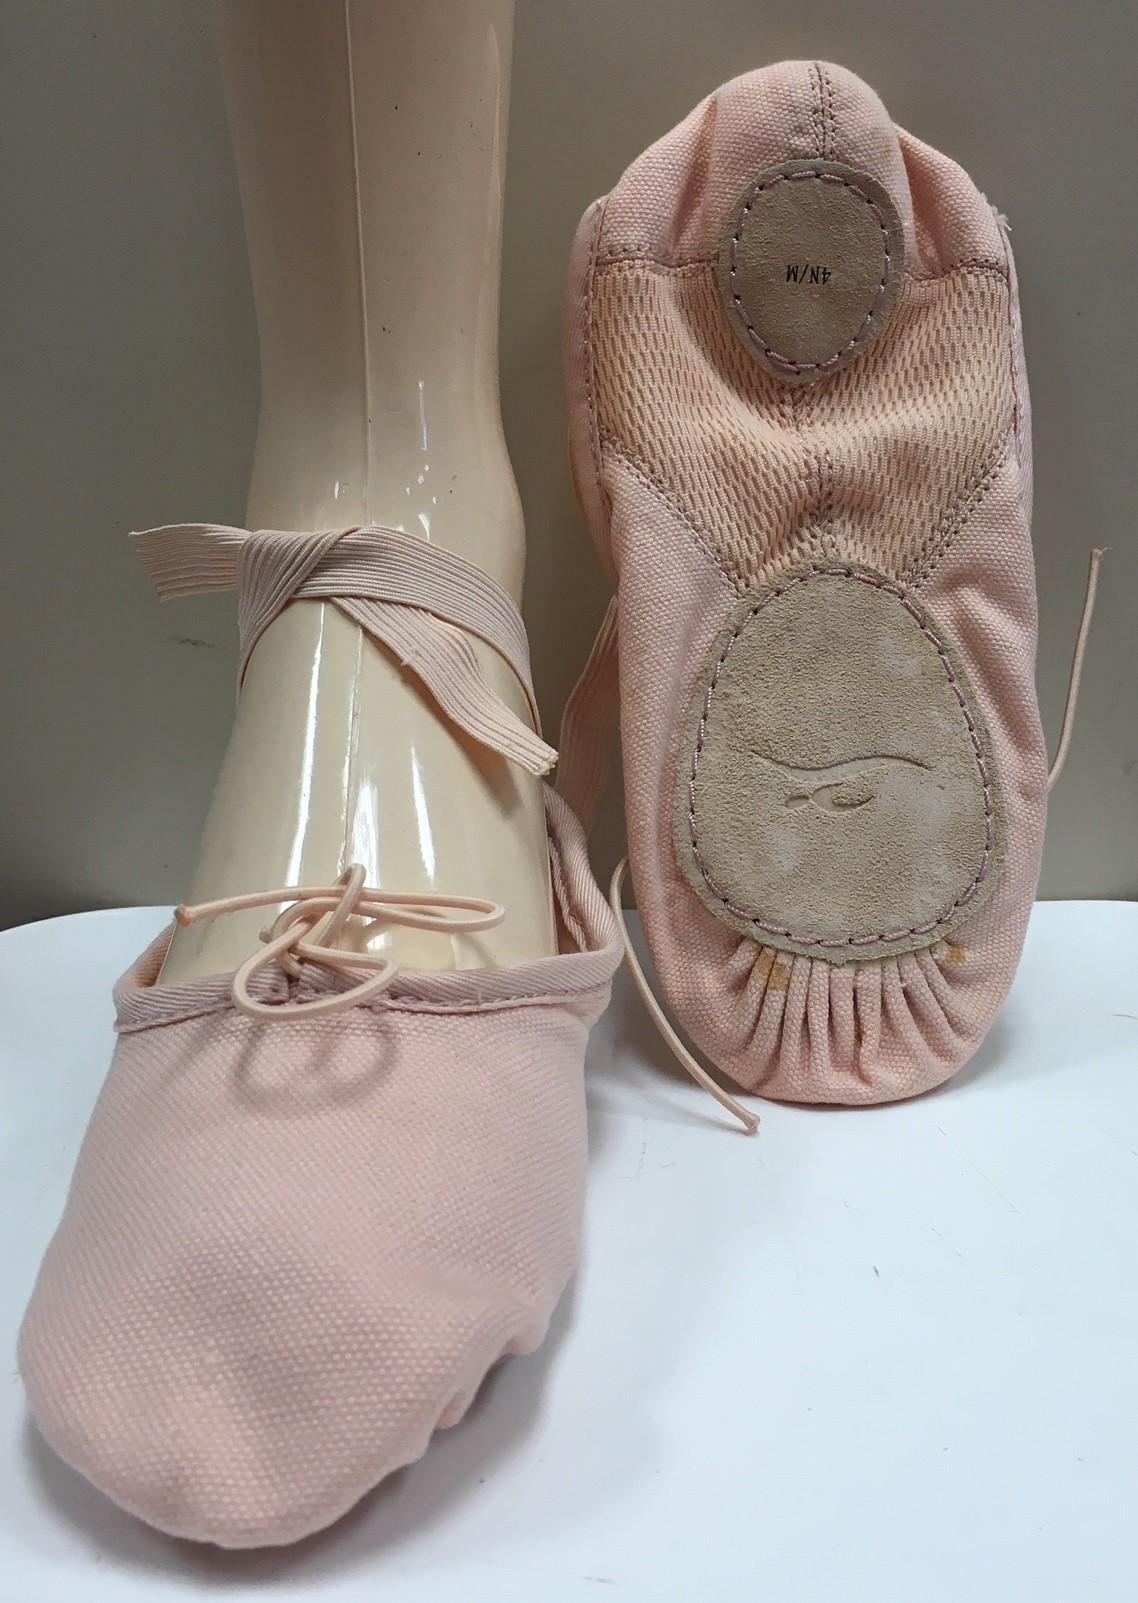 Motionwear Children's Canvas Upper Split Leather Sole Ballet Shoes